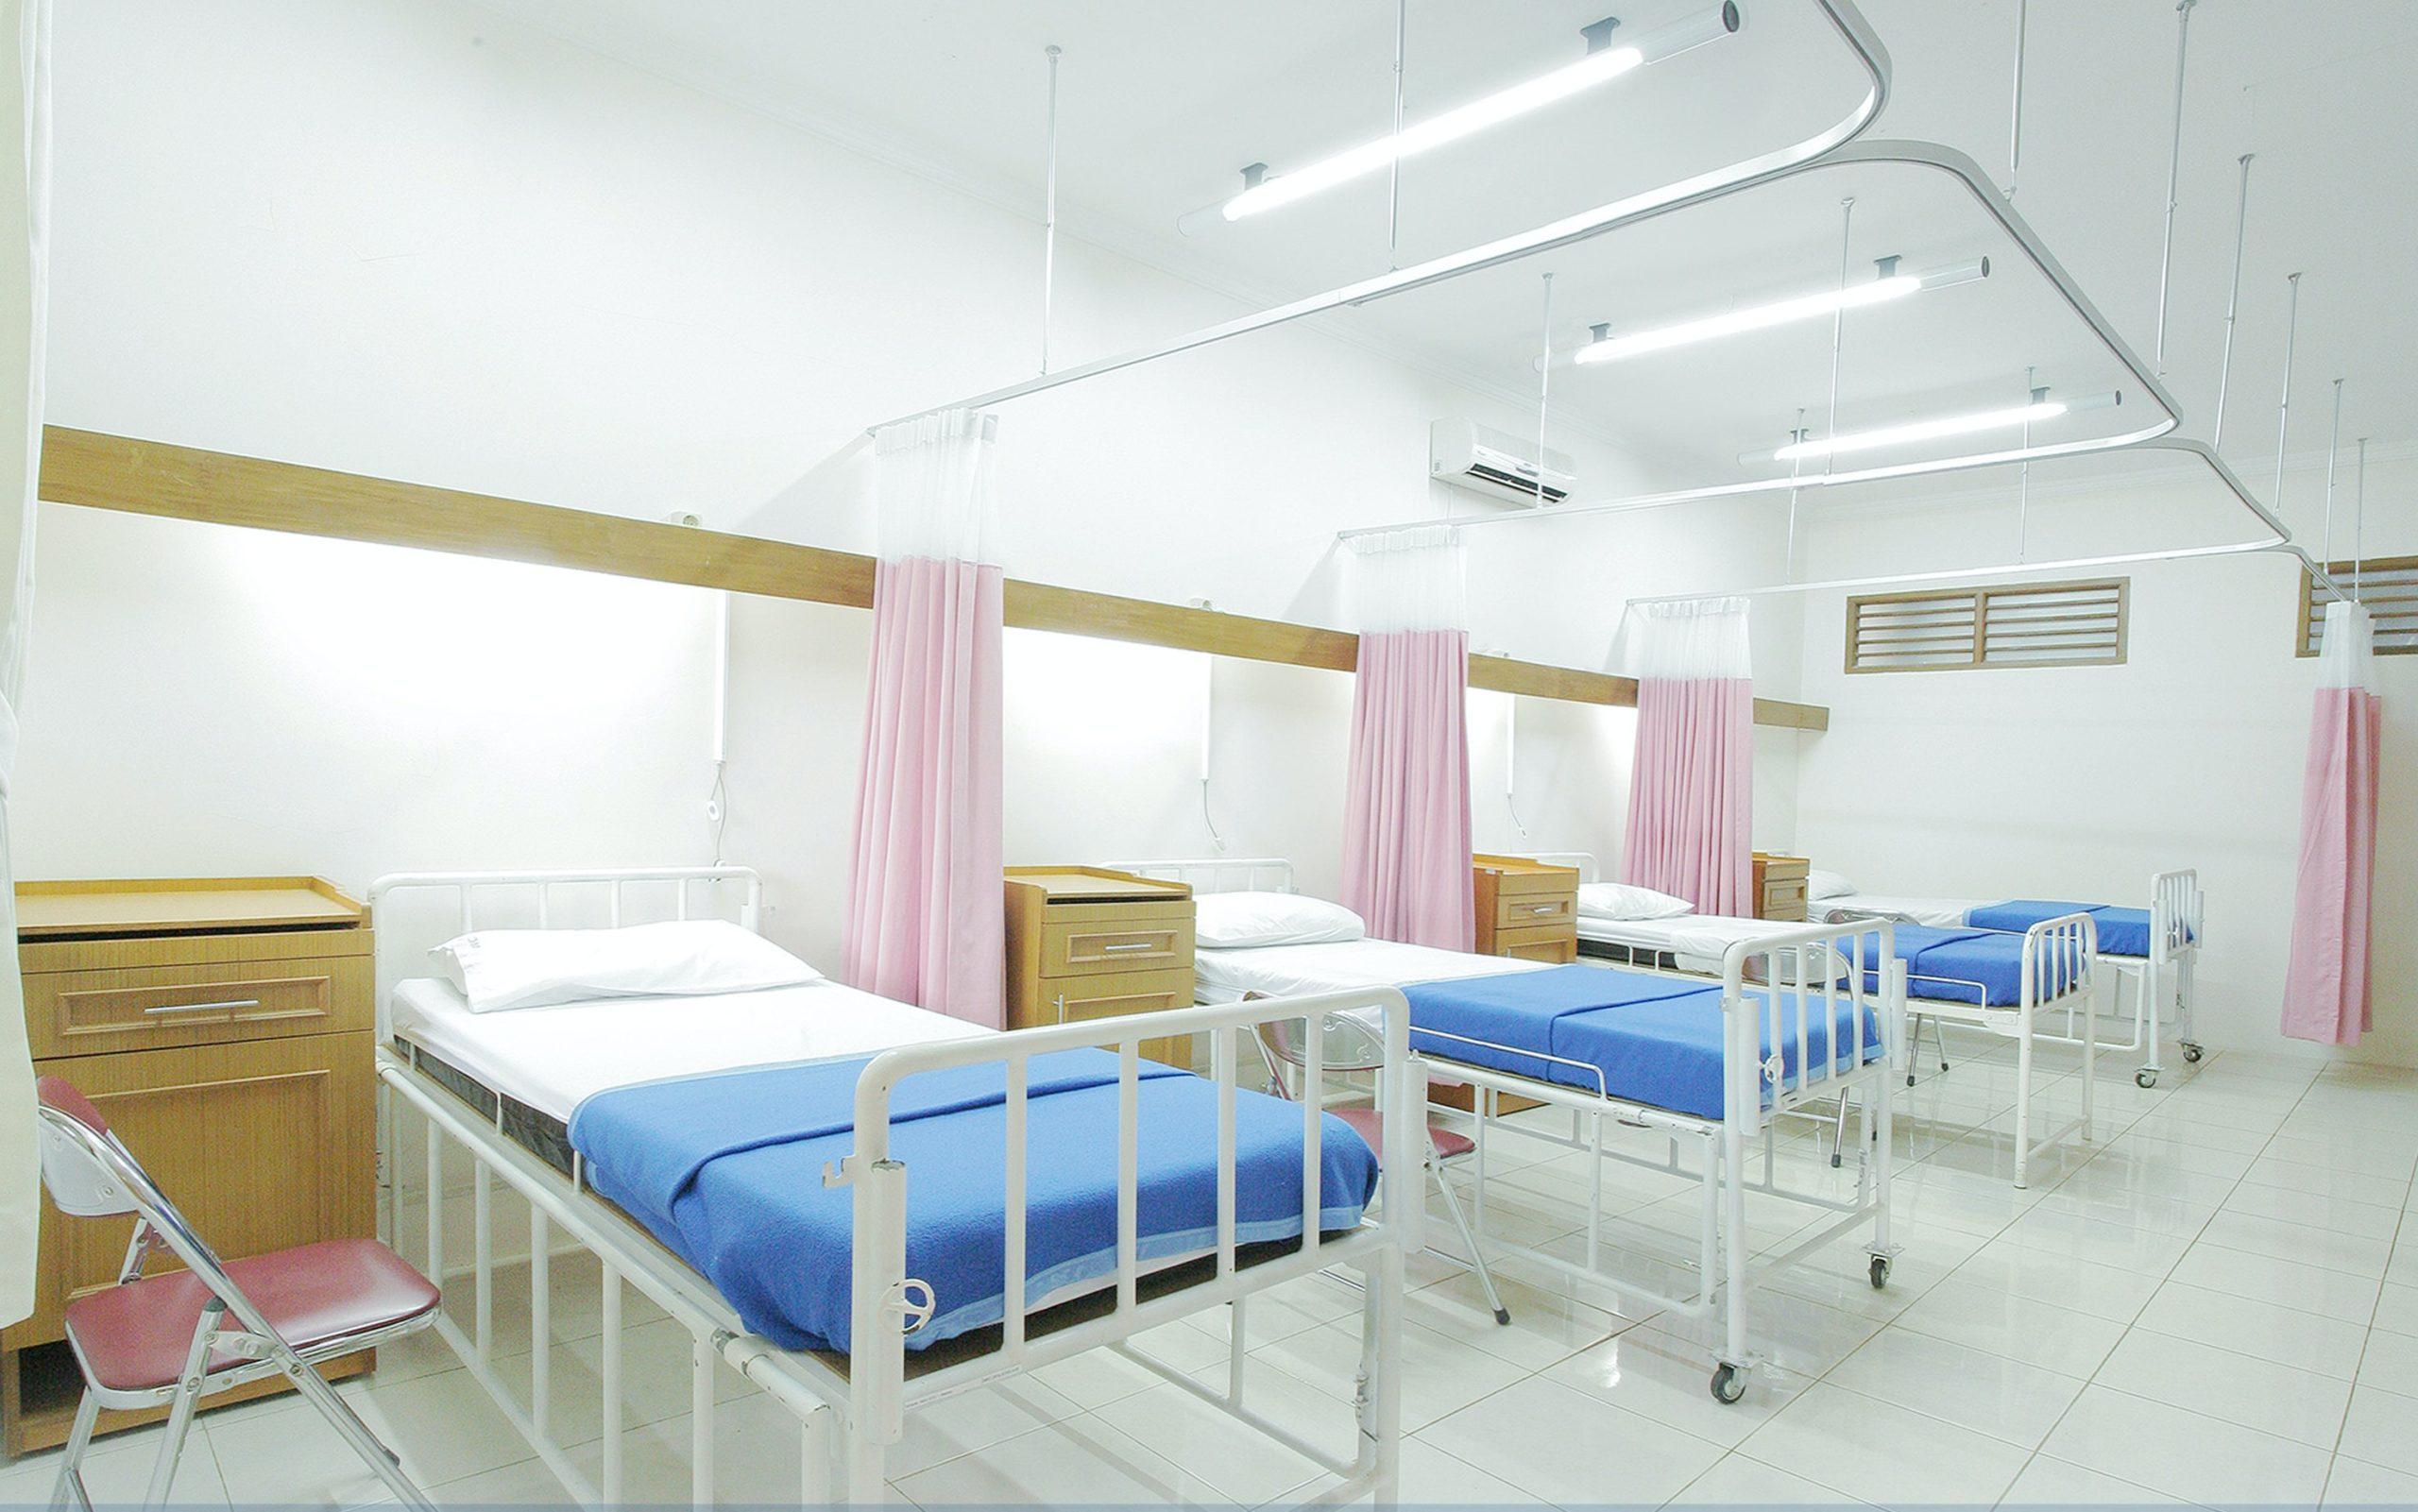 【Japanese Vocabulary】Hospital:病院(びょういん)